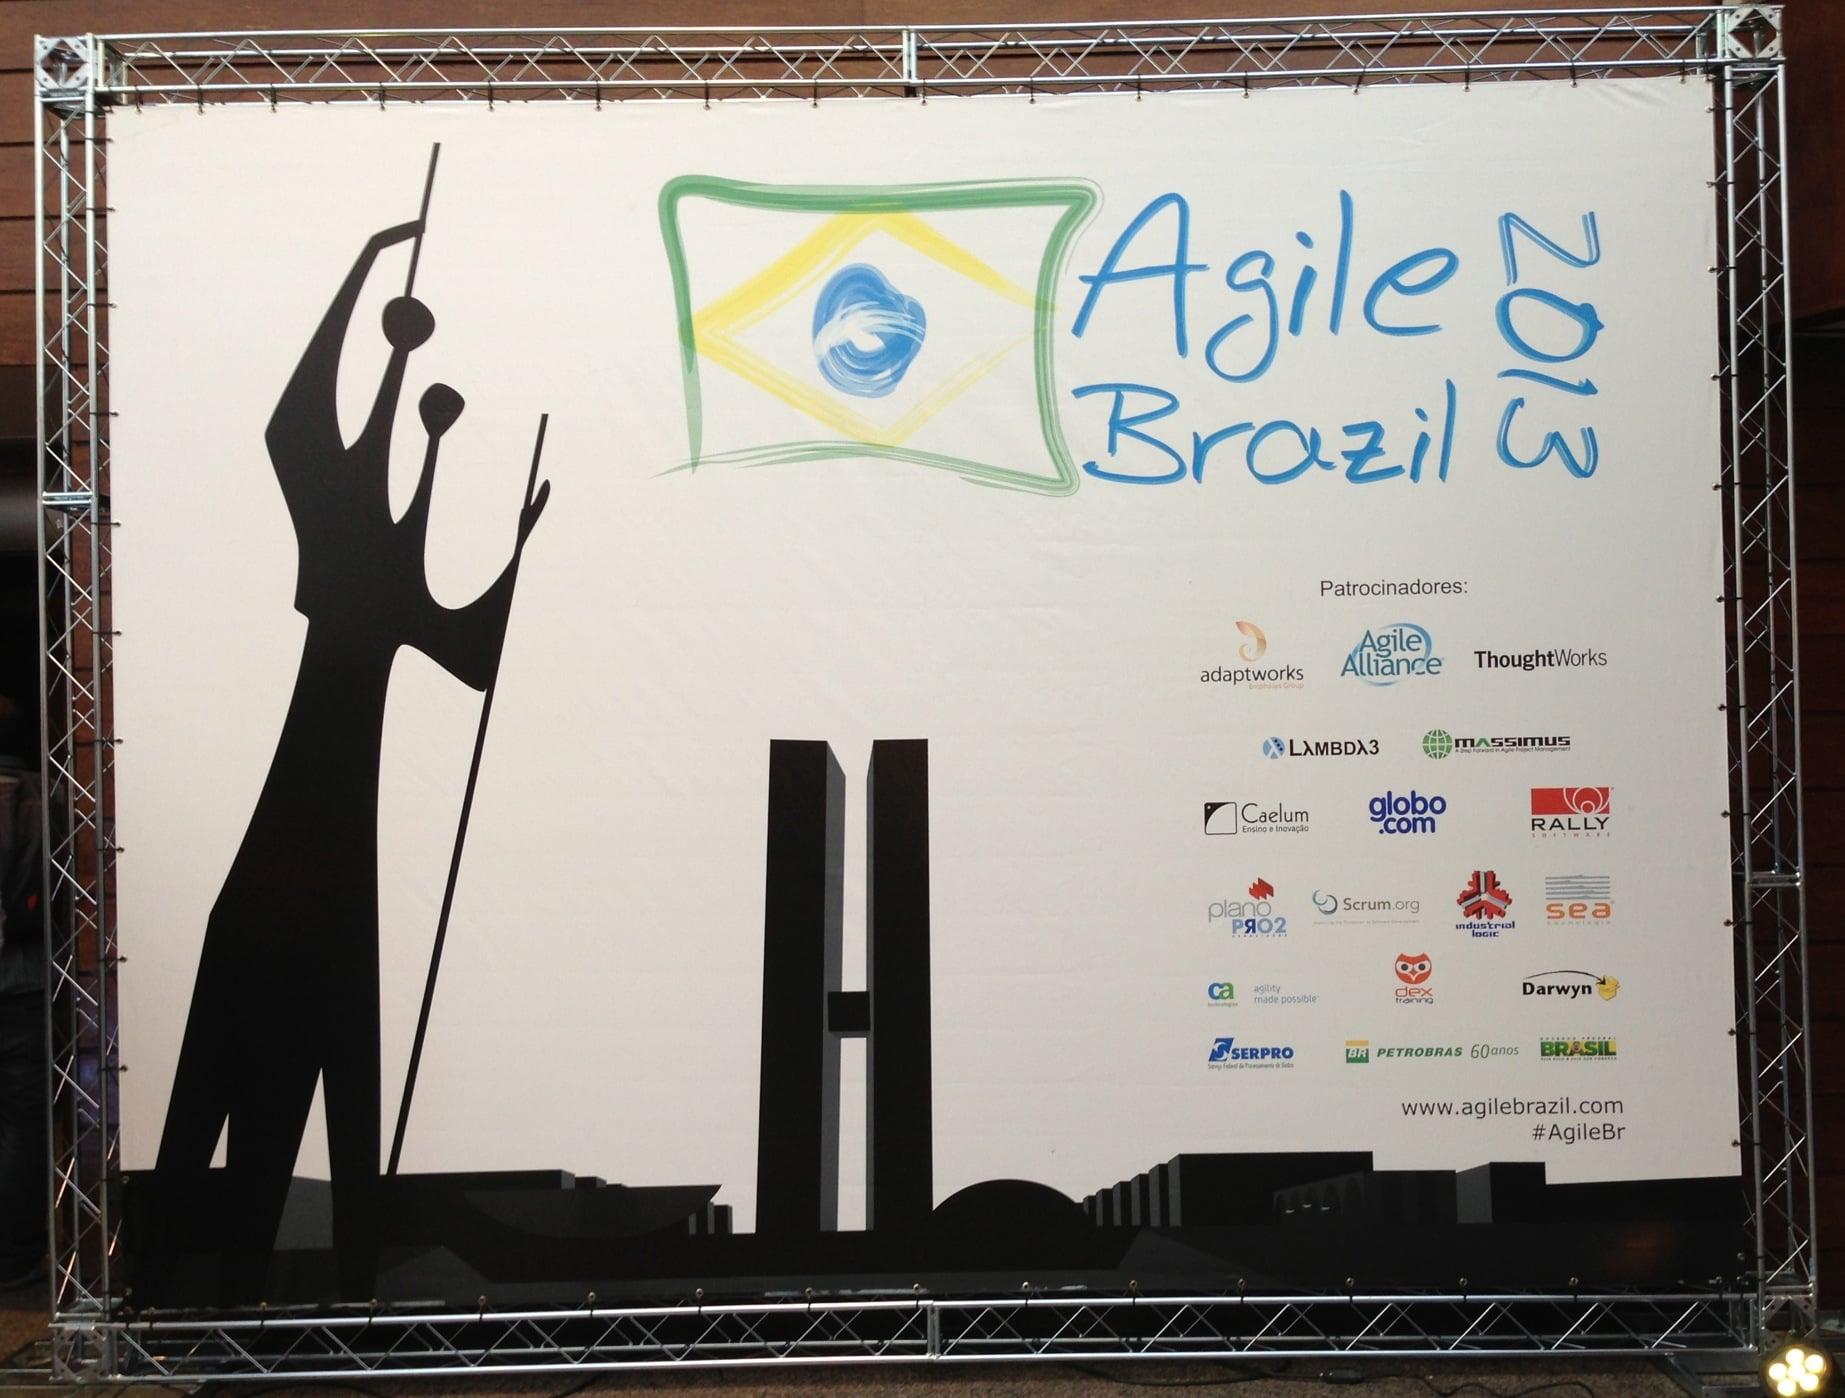 Agile Brazil 2013